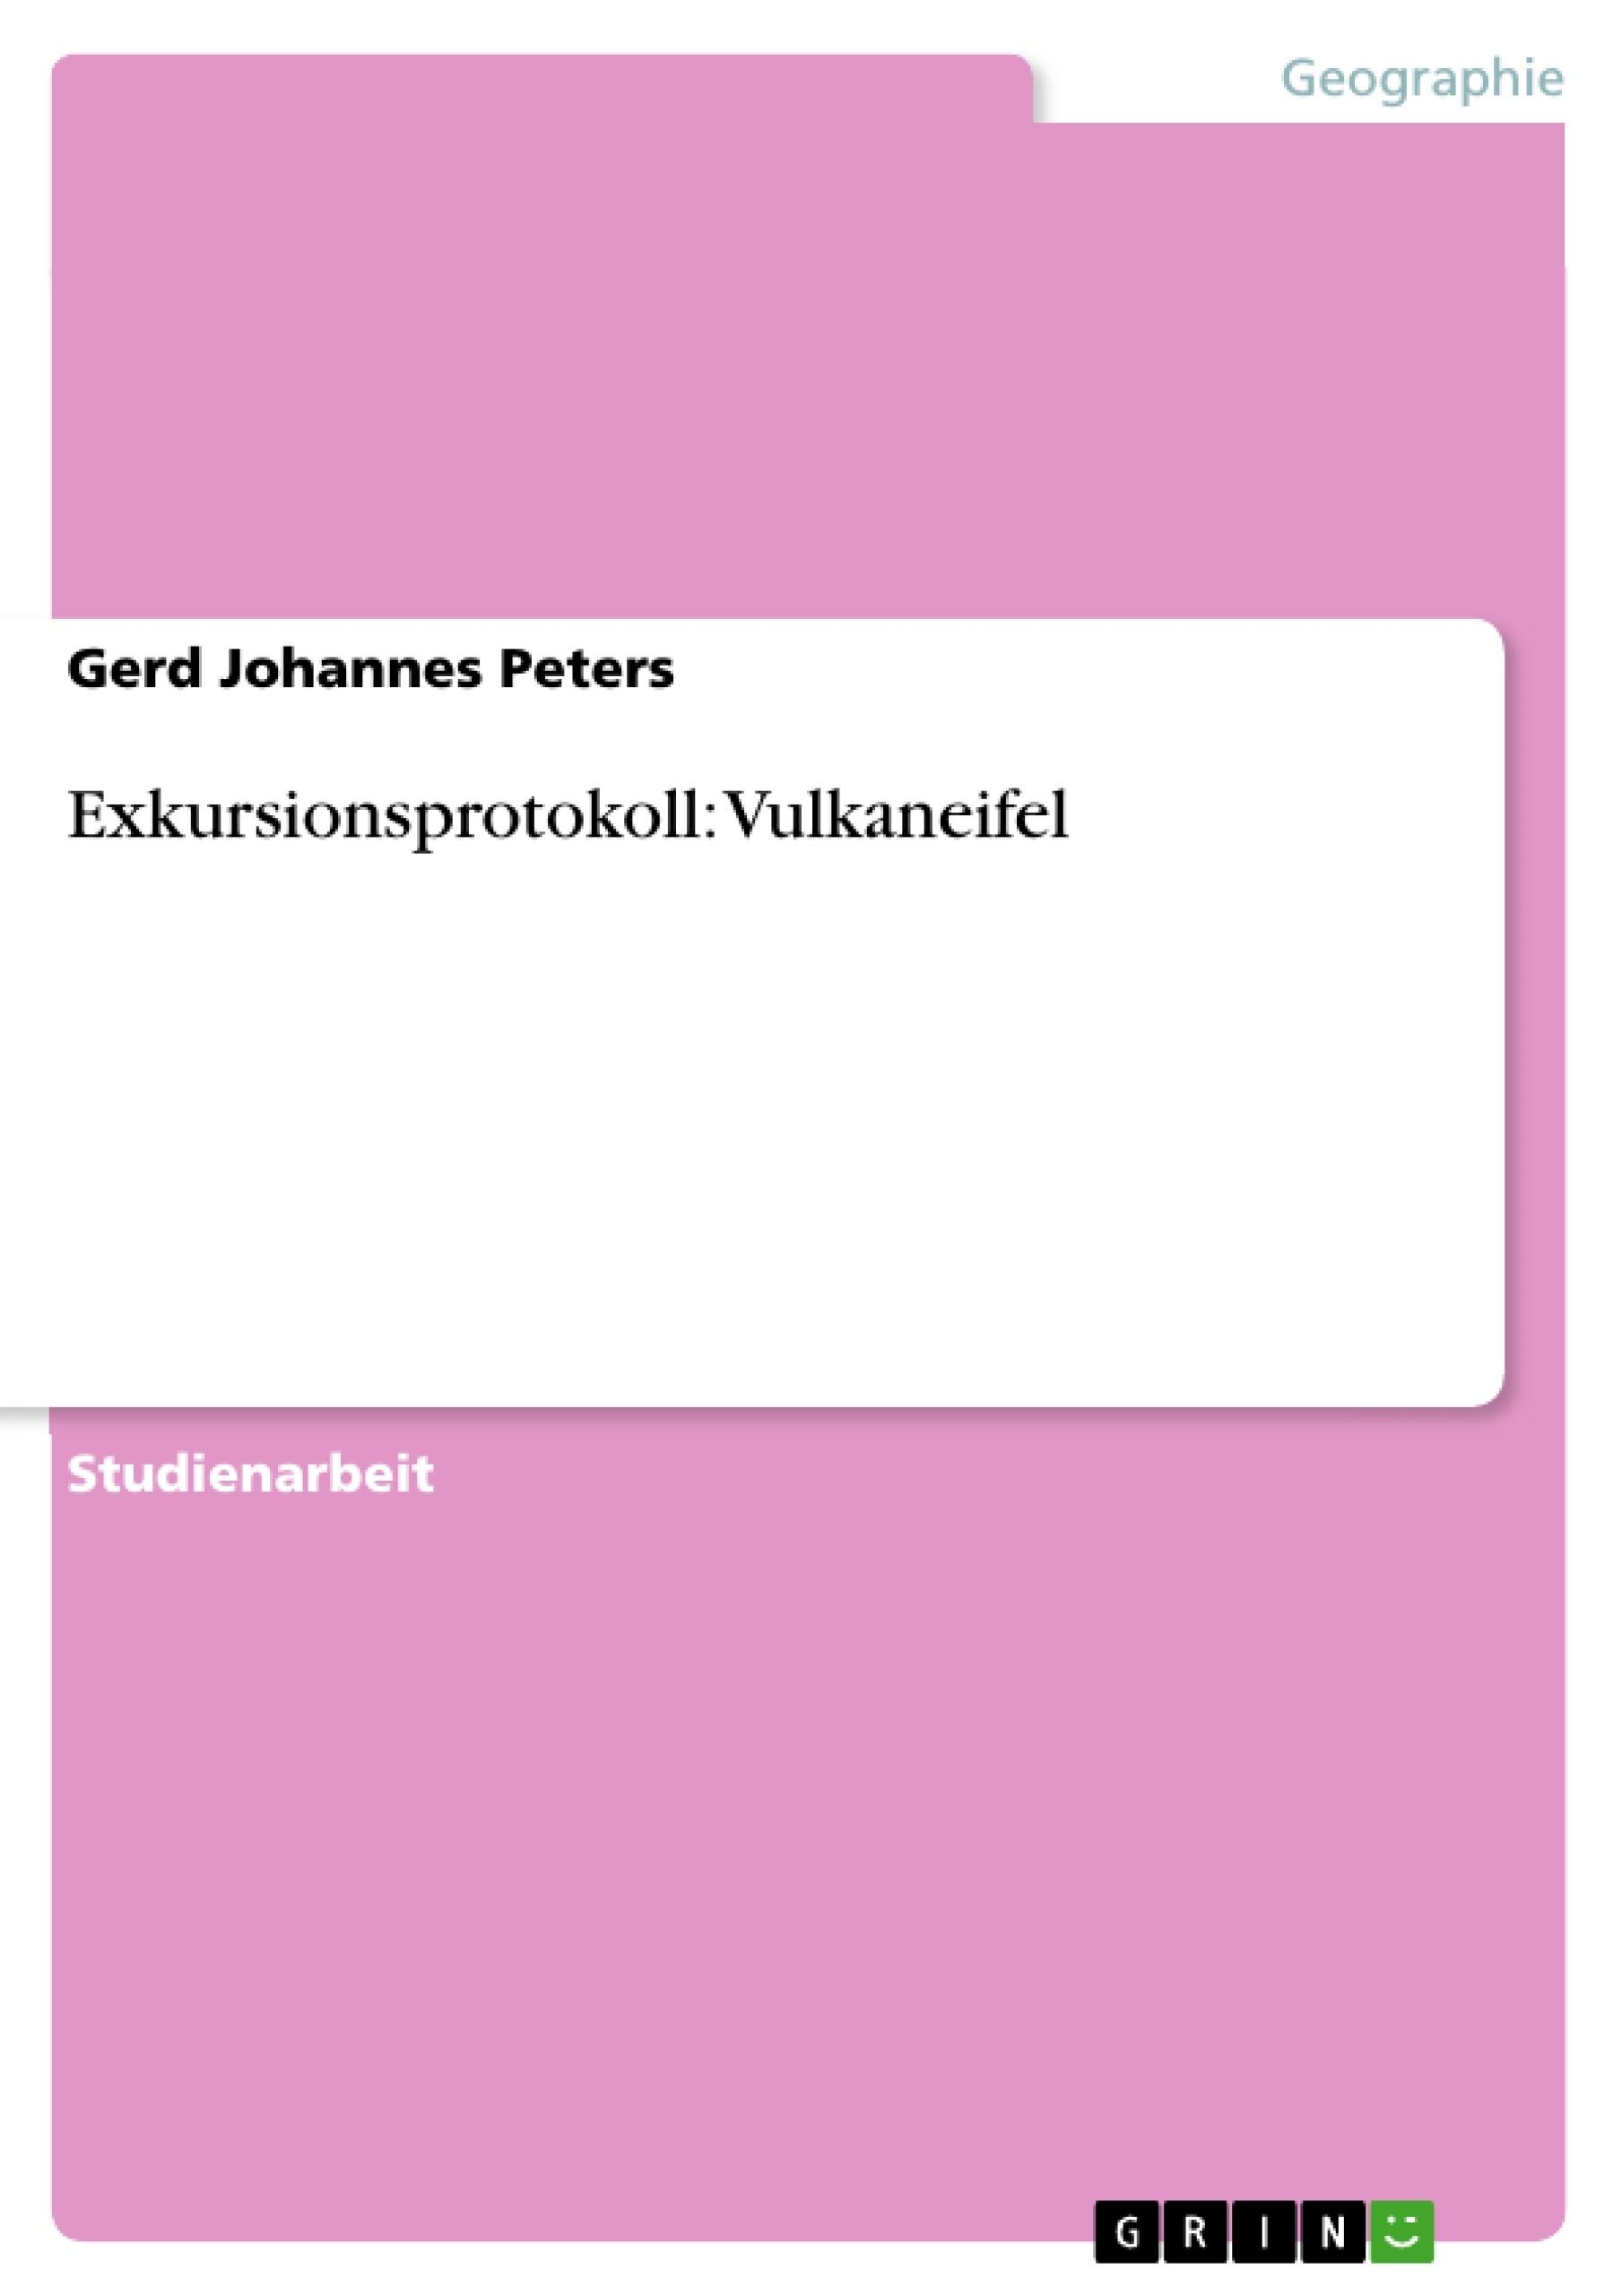 Titel: Exkursionsprotokoll: Vulkaneifel